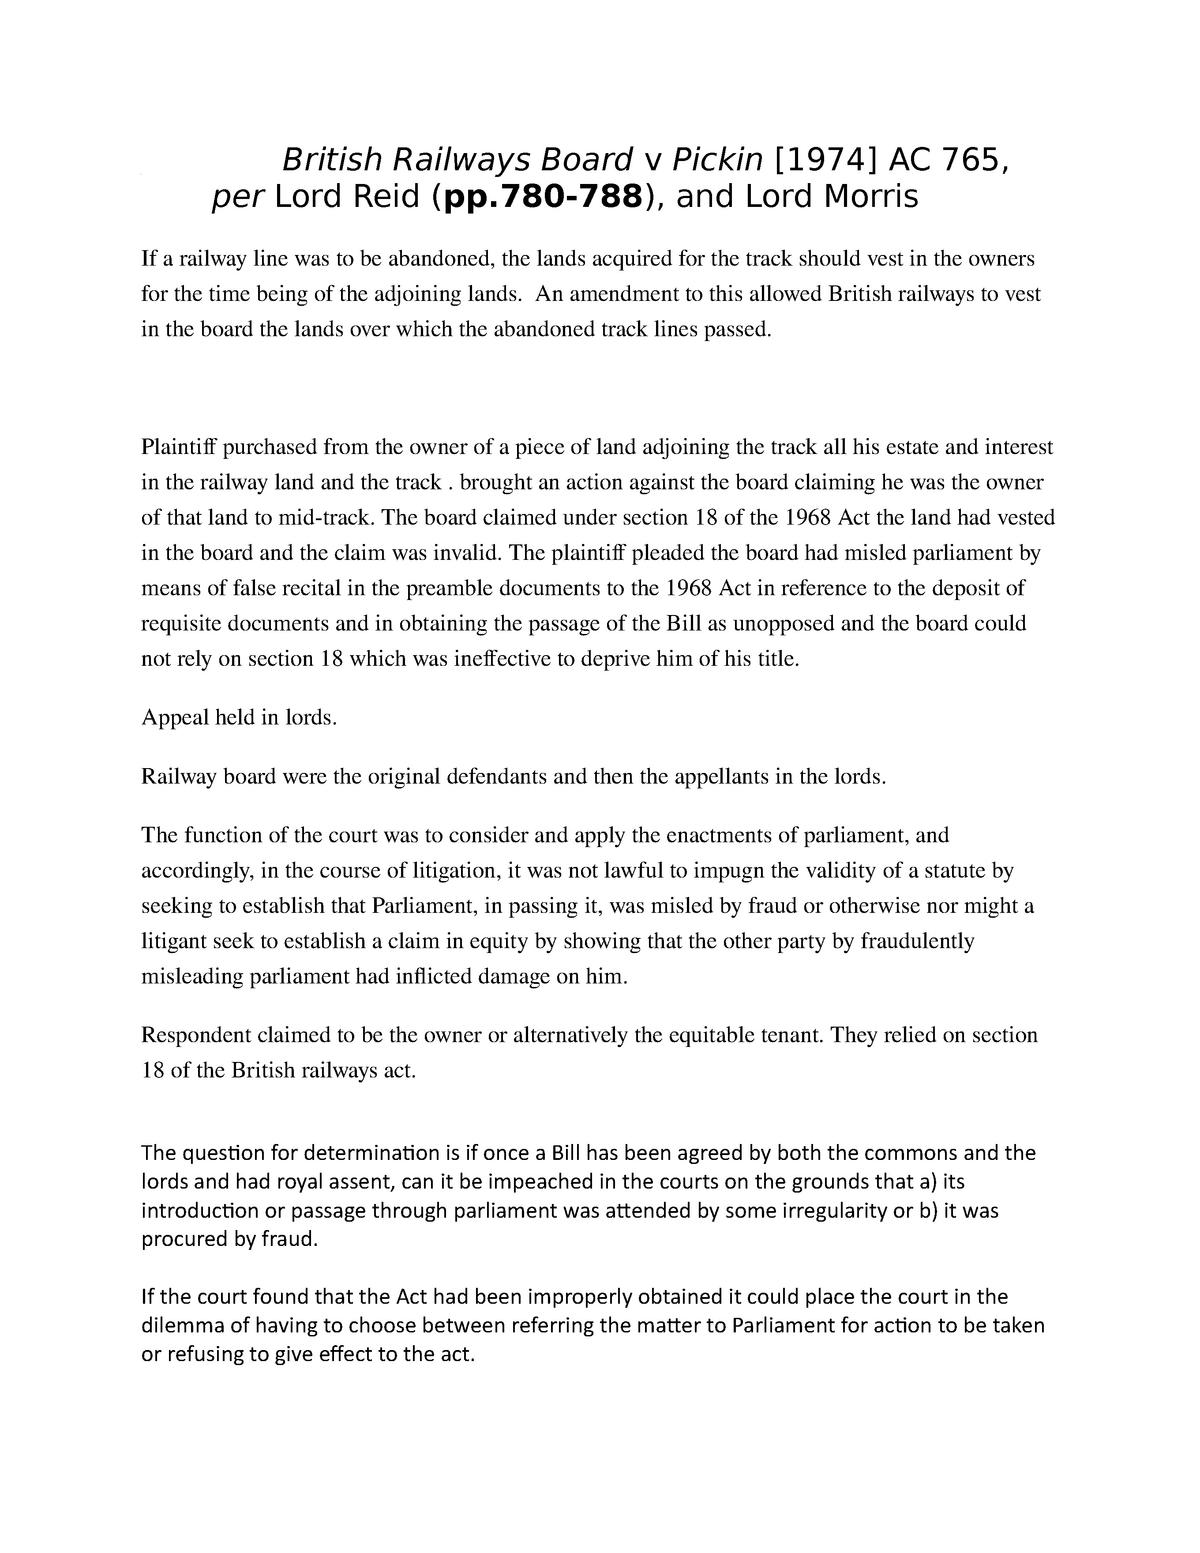 British Railways Board v Pickin - LAW 213x: Public Law - StuDocu